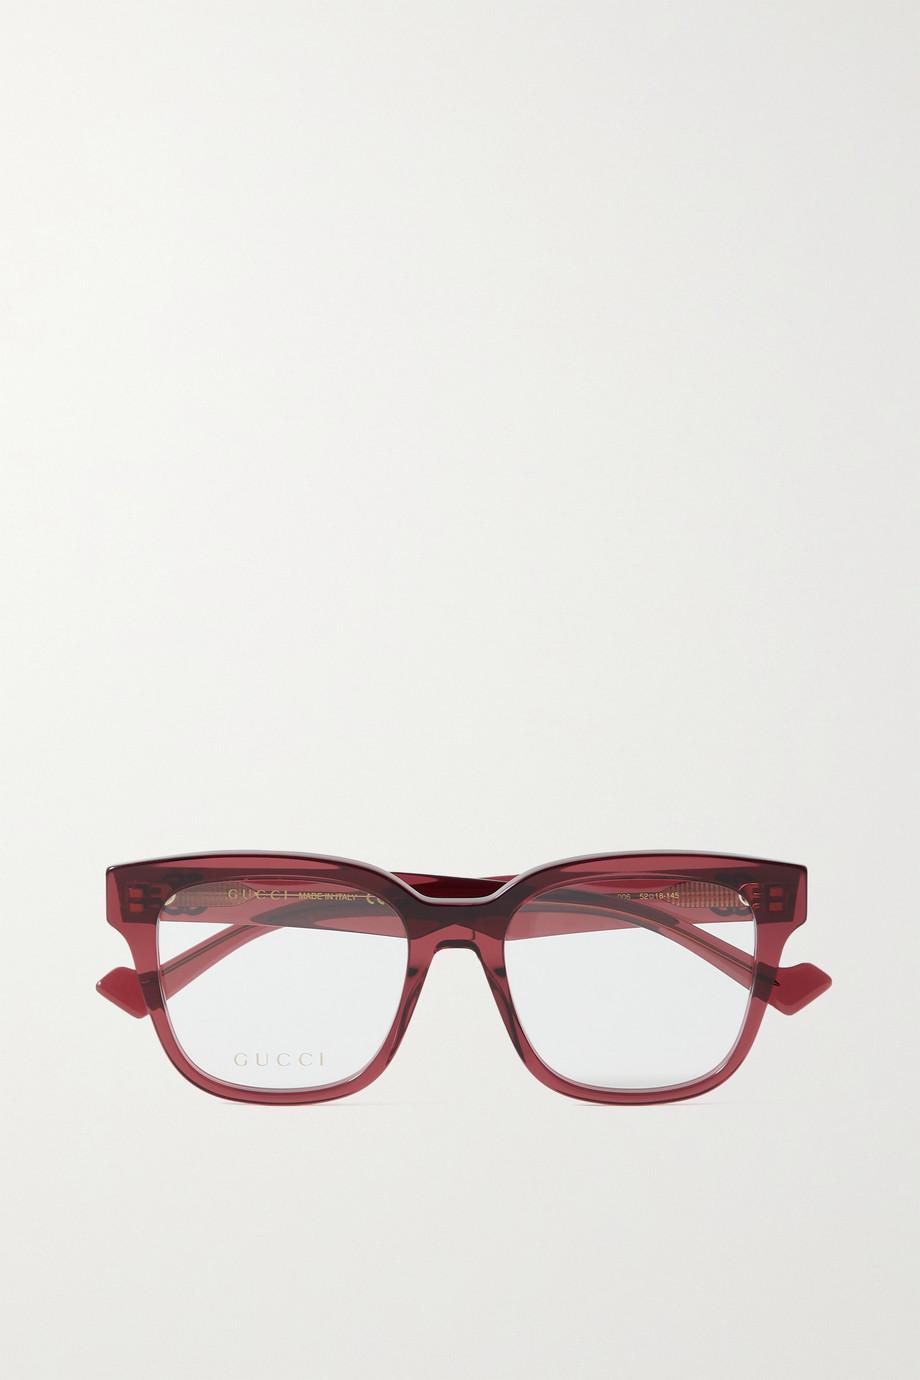 Gucci Generation D-frame acetate optical glasses